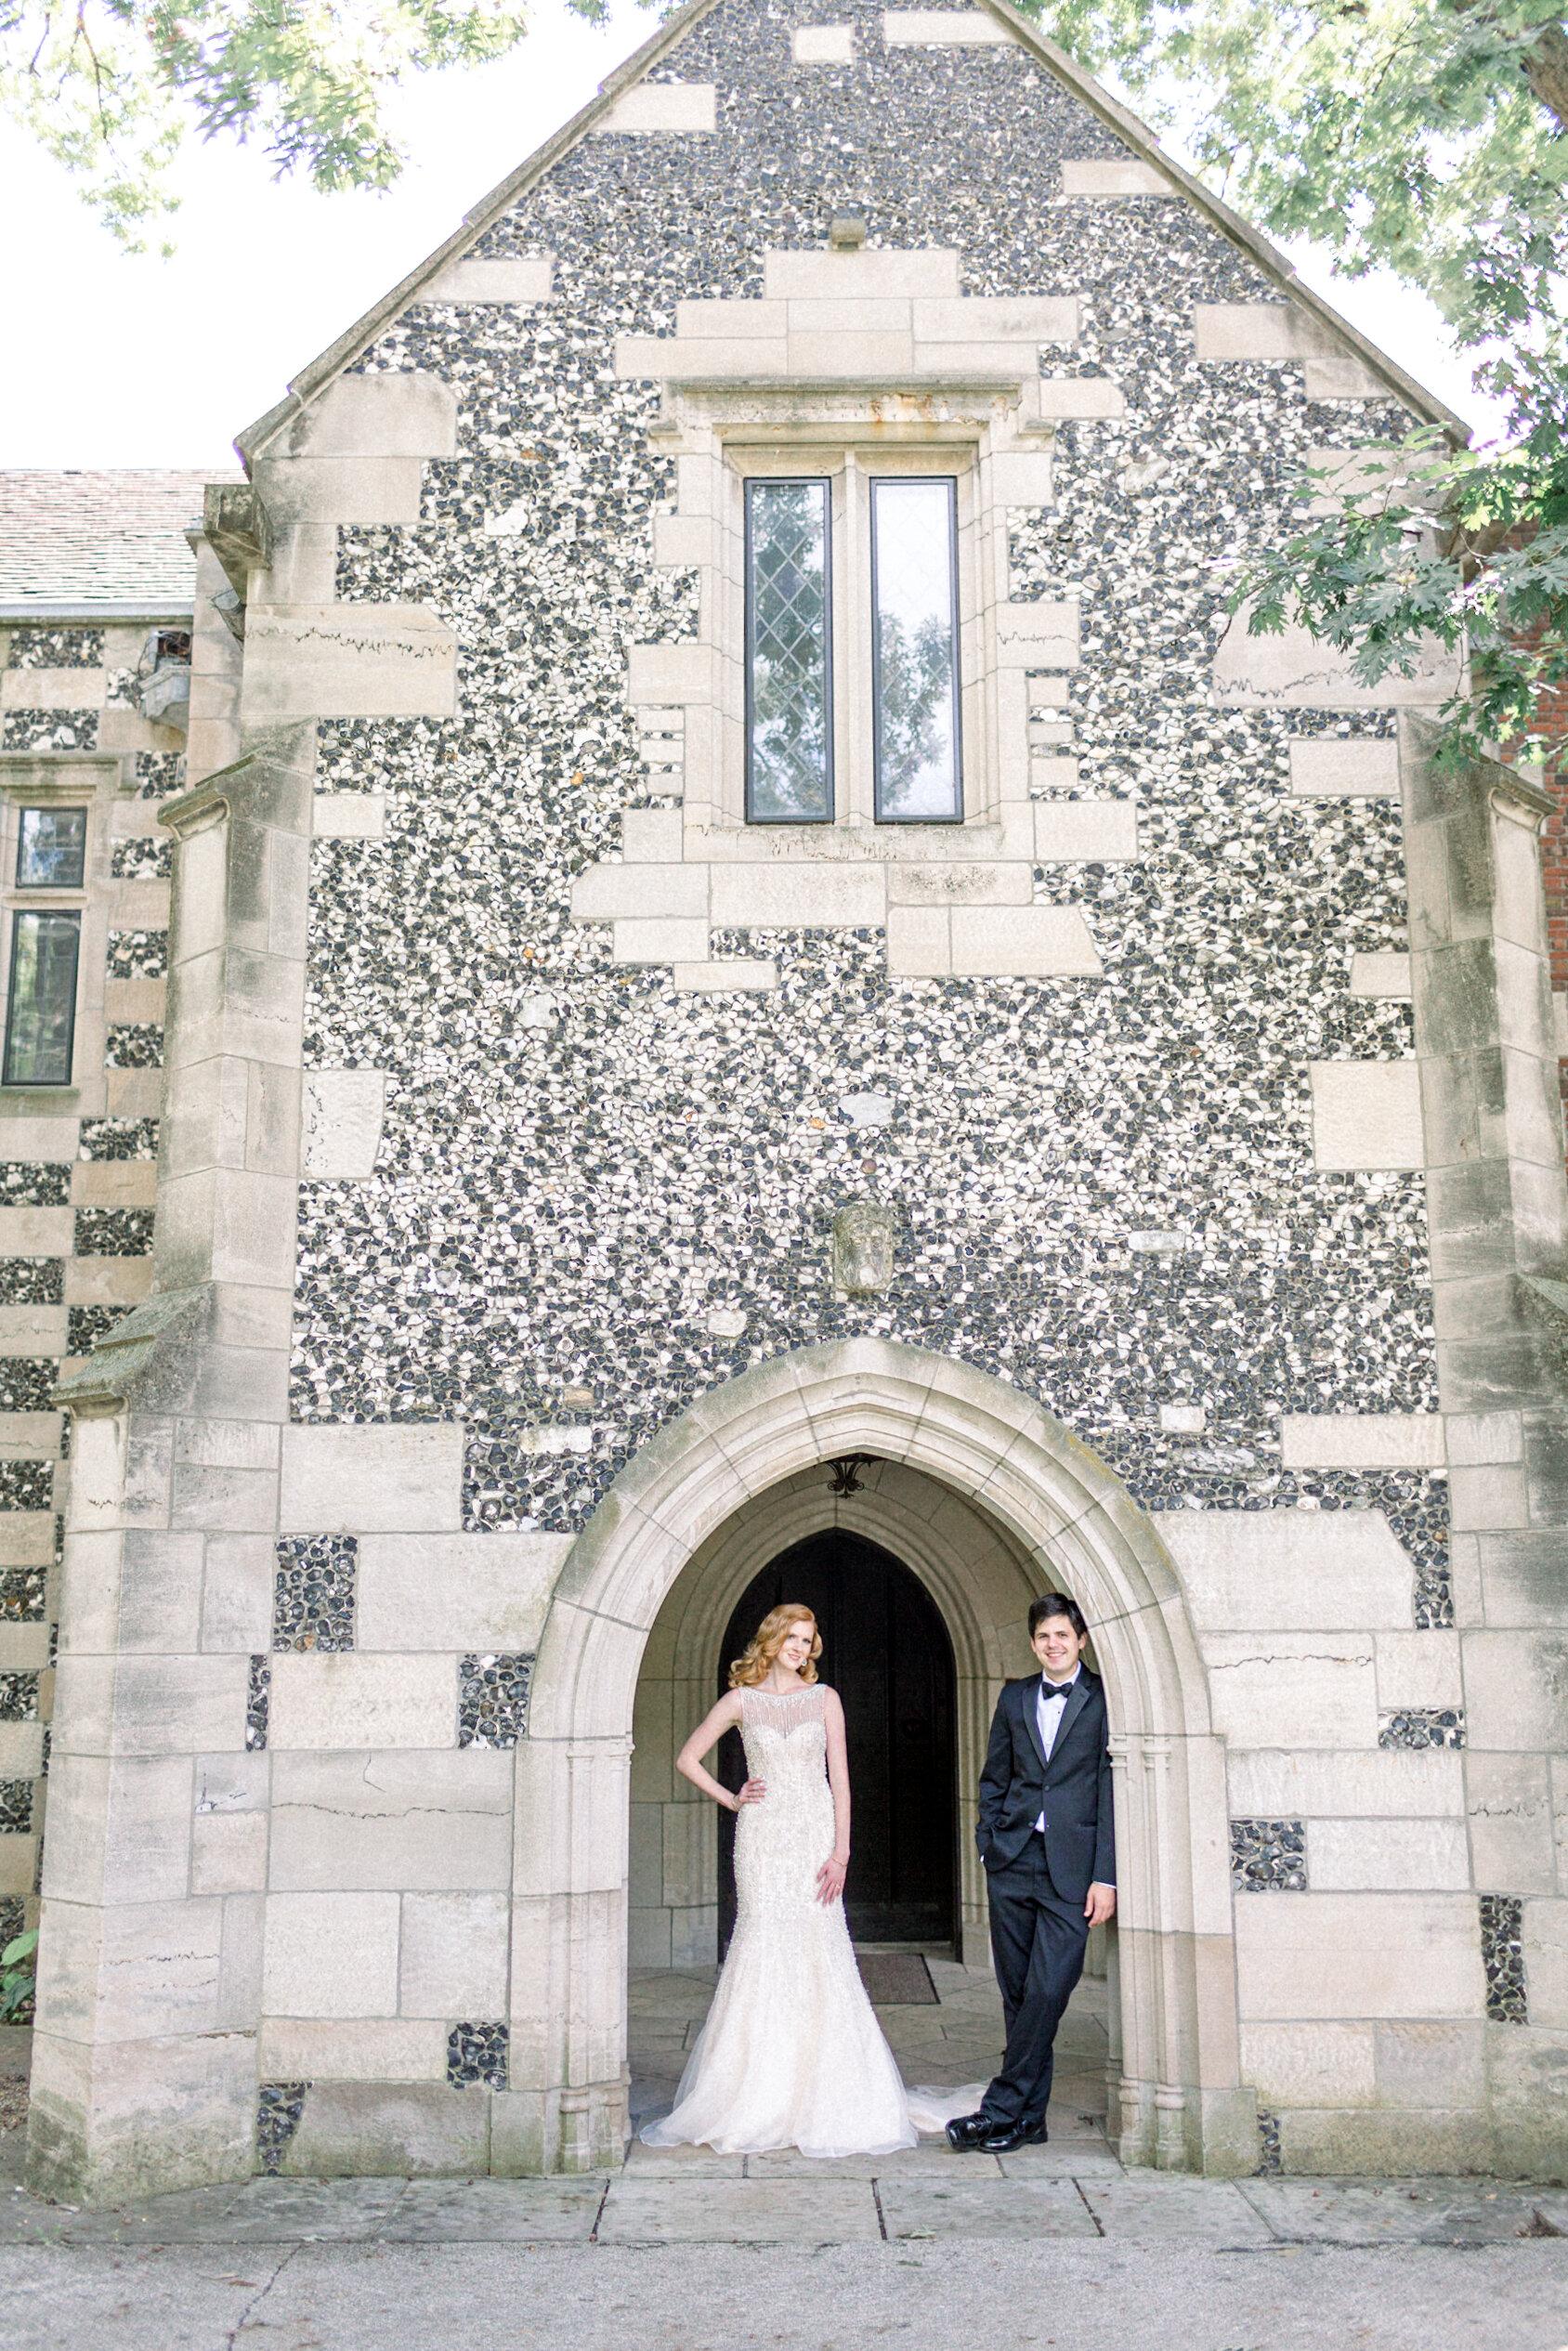 bride and groom in doorway arch of old building